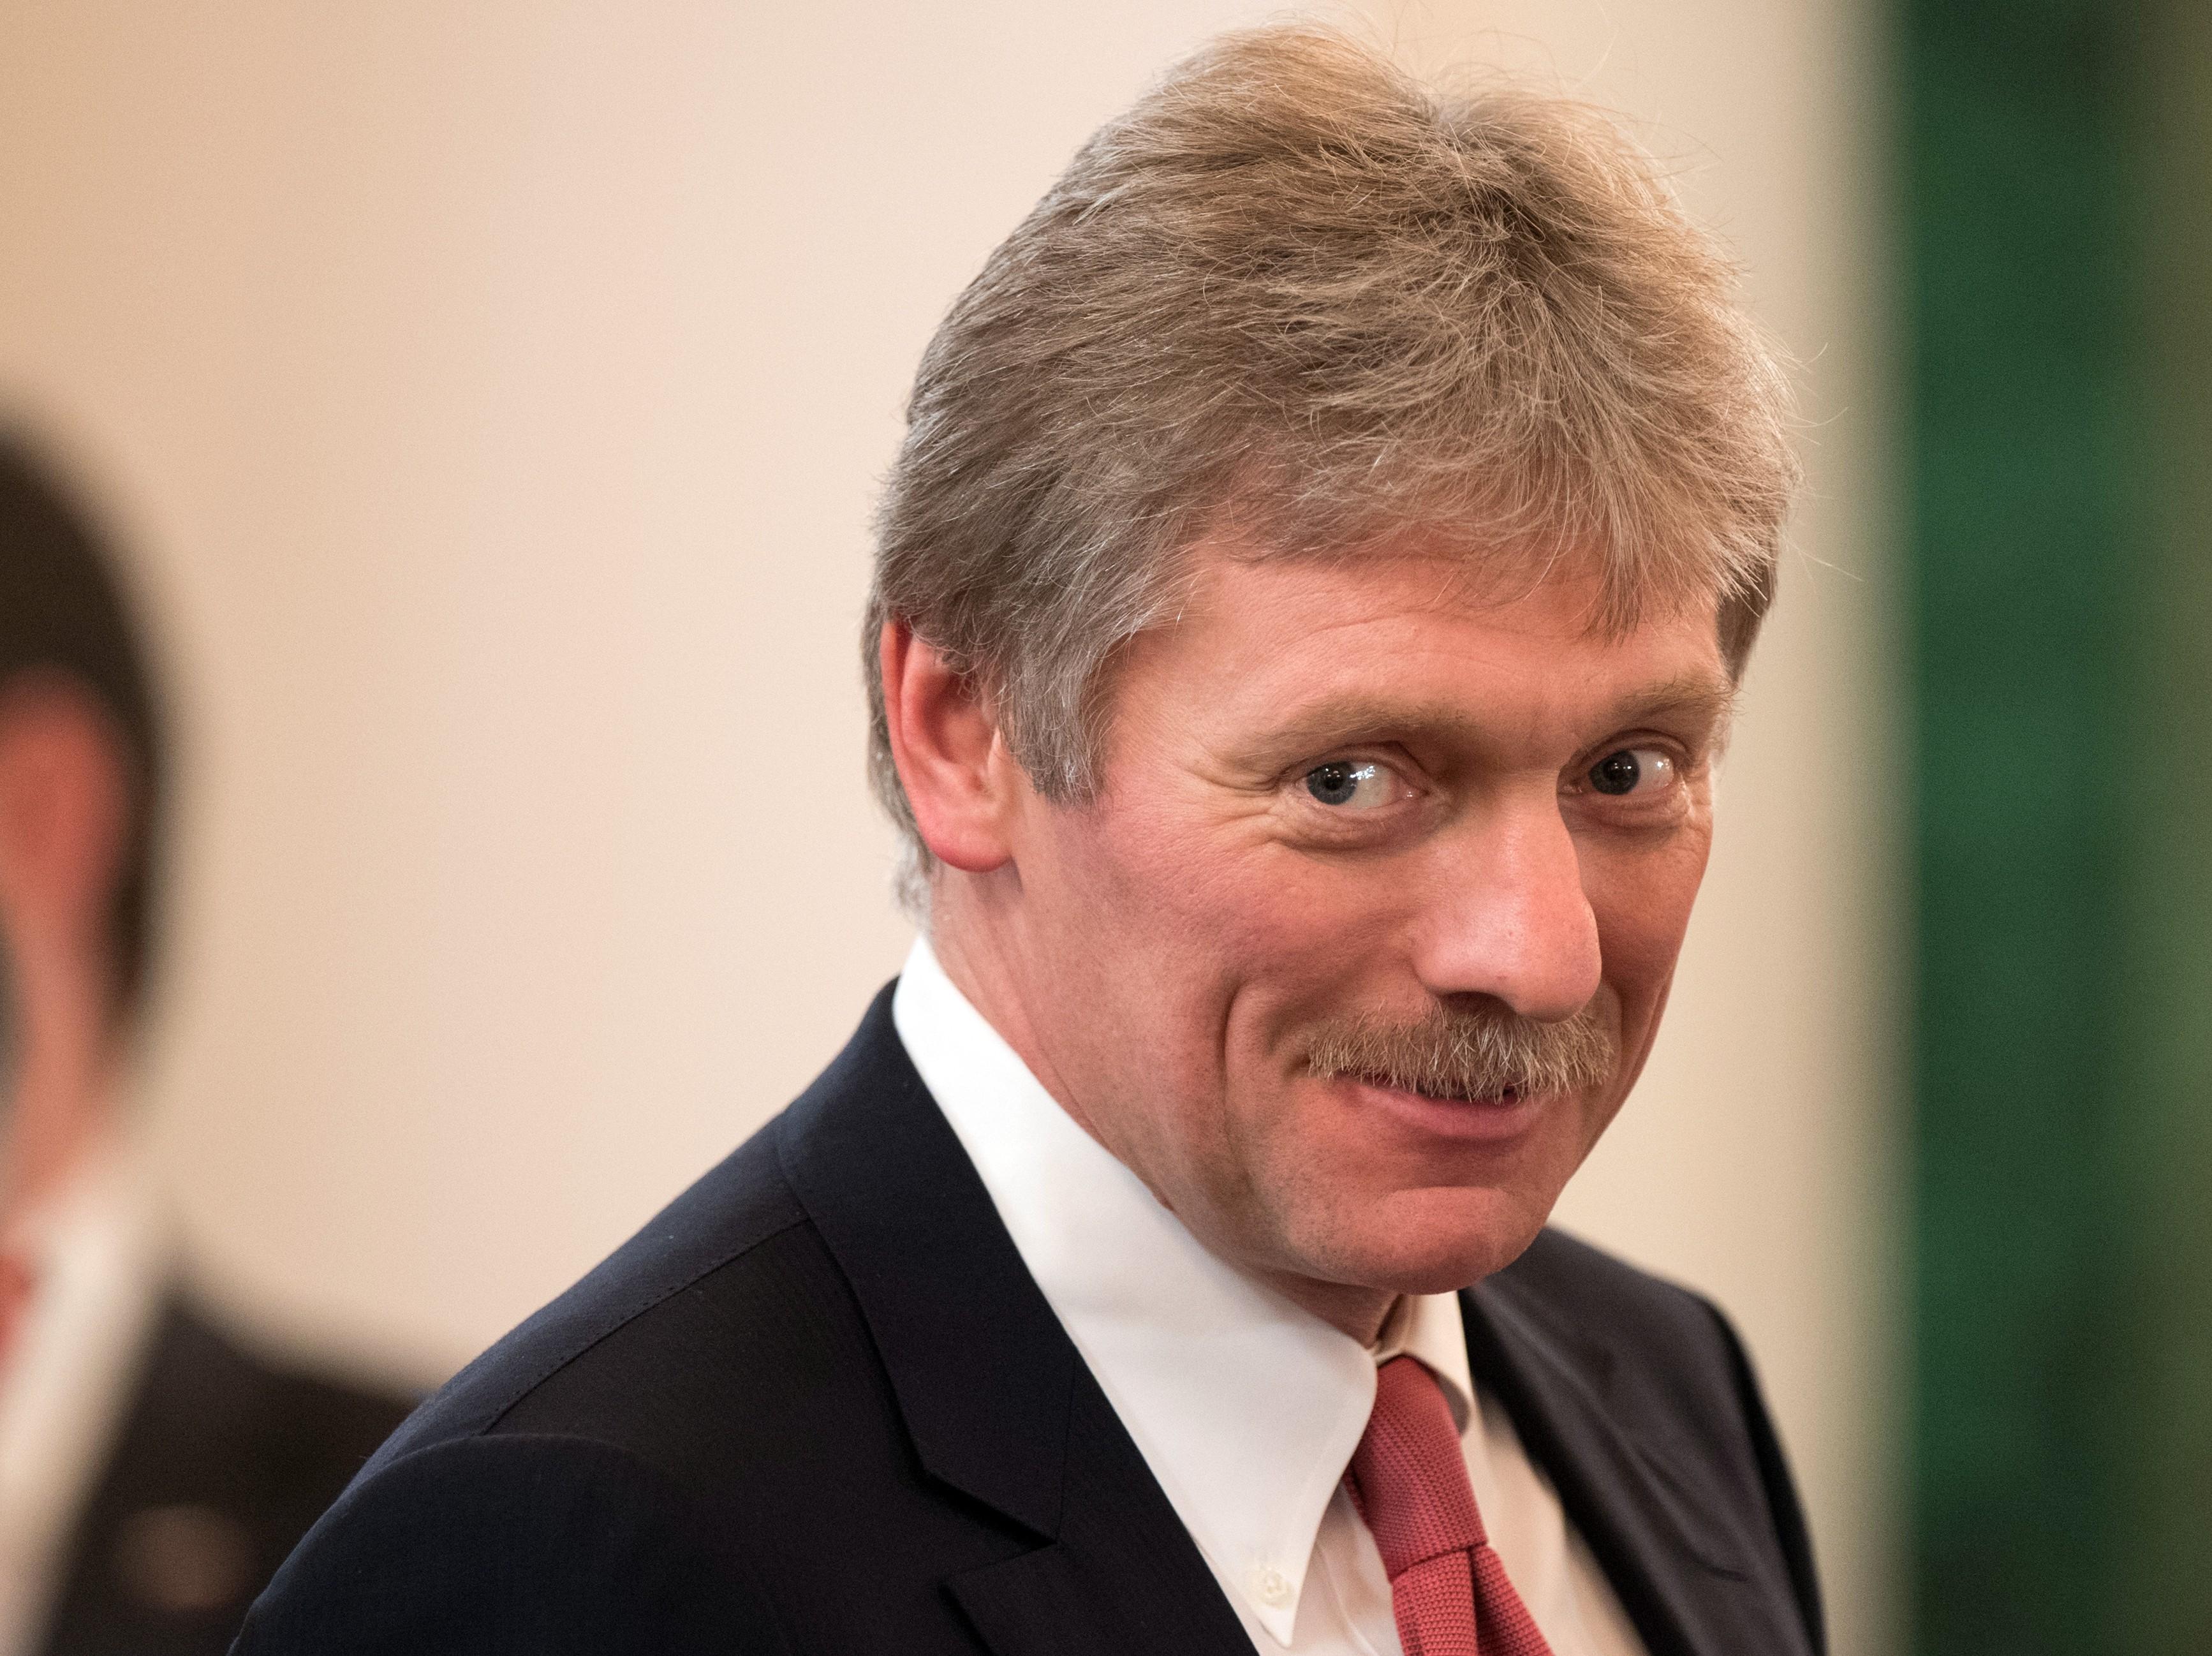 <p>Фото: &copy;РИА Новости/Сергей Гунеев</p>